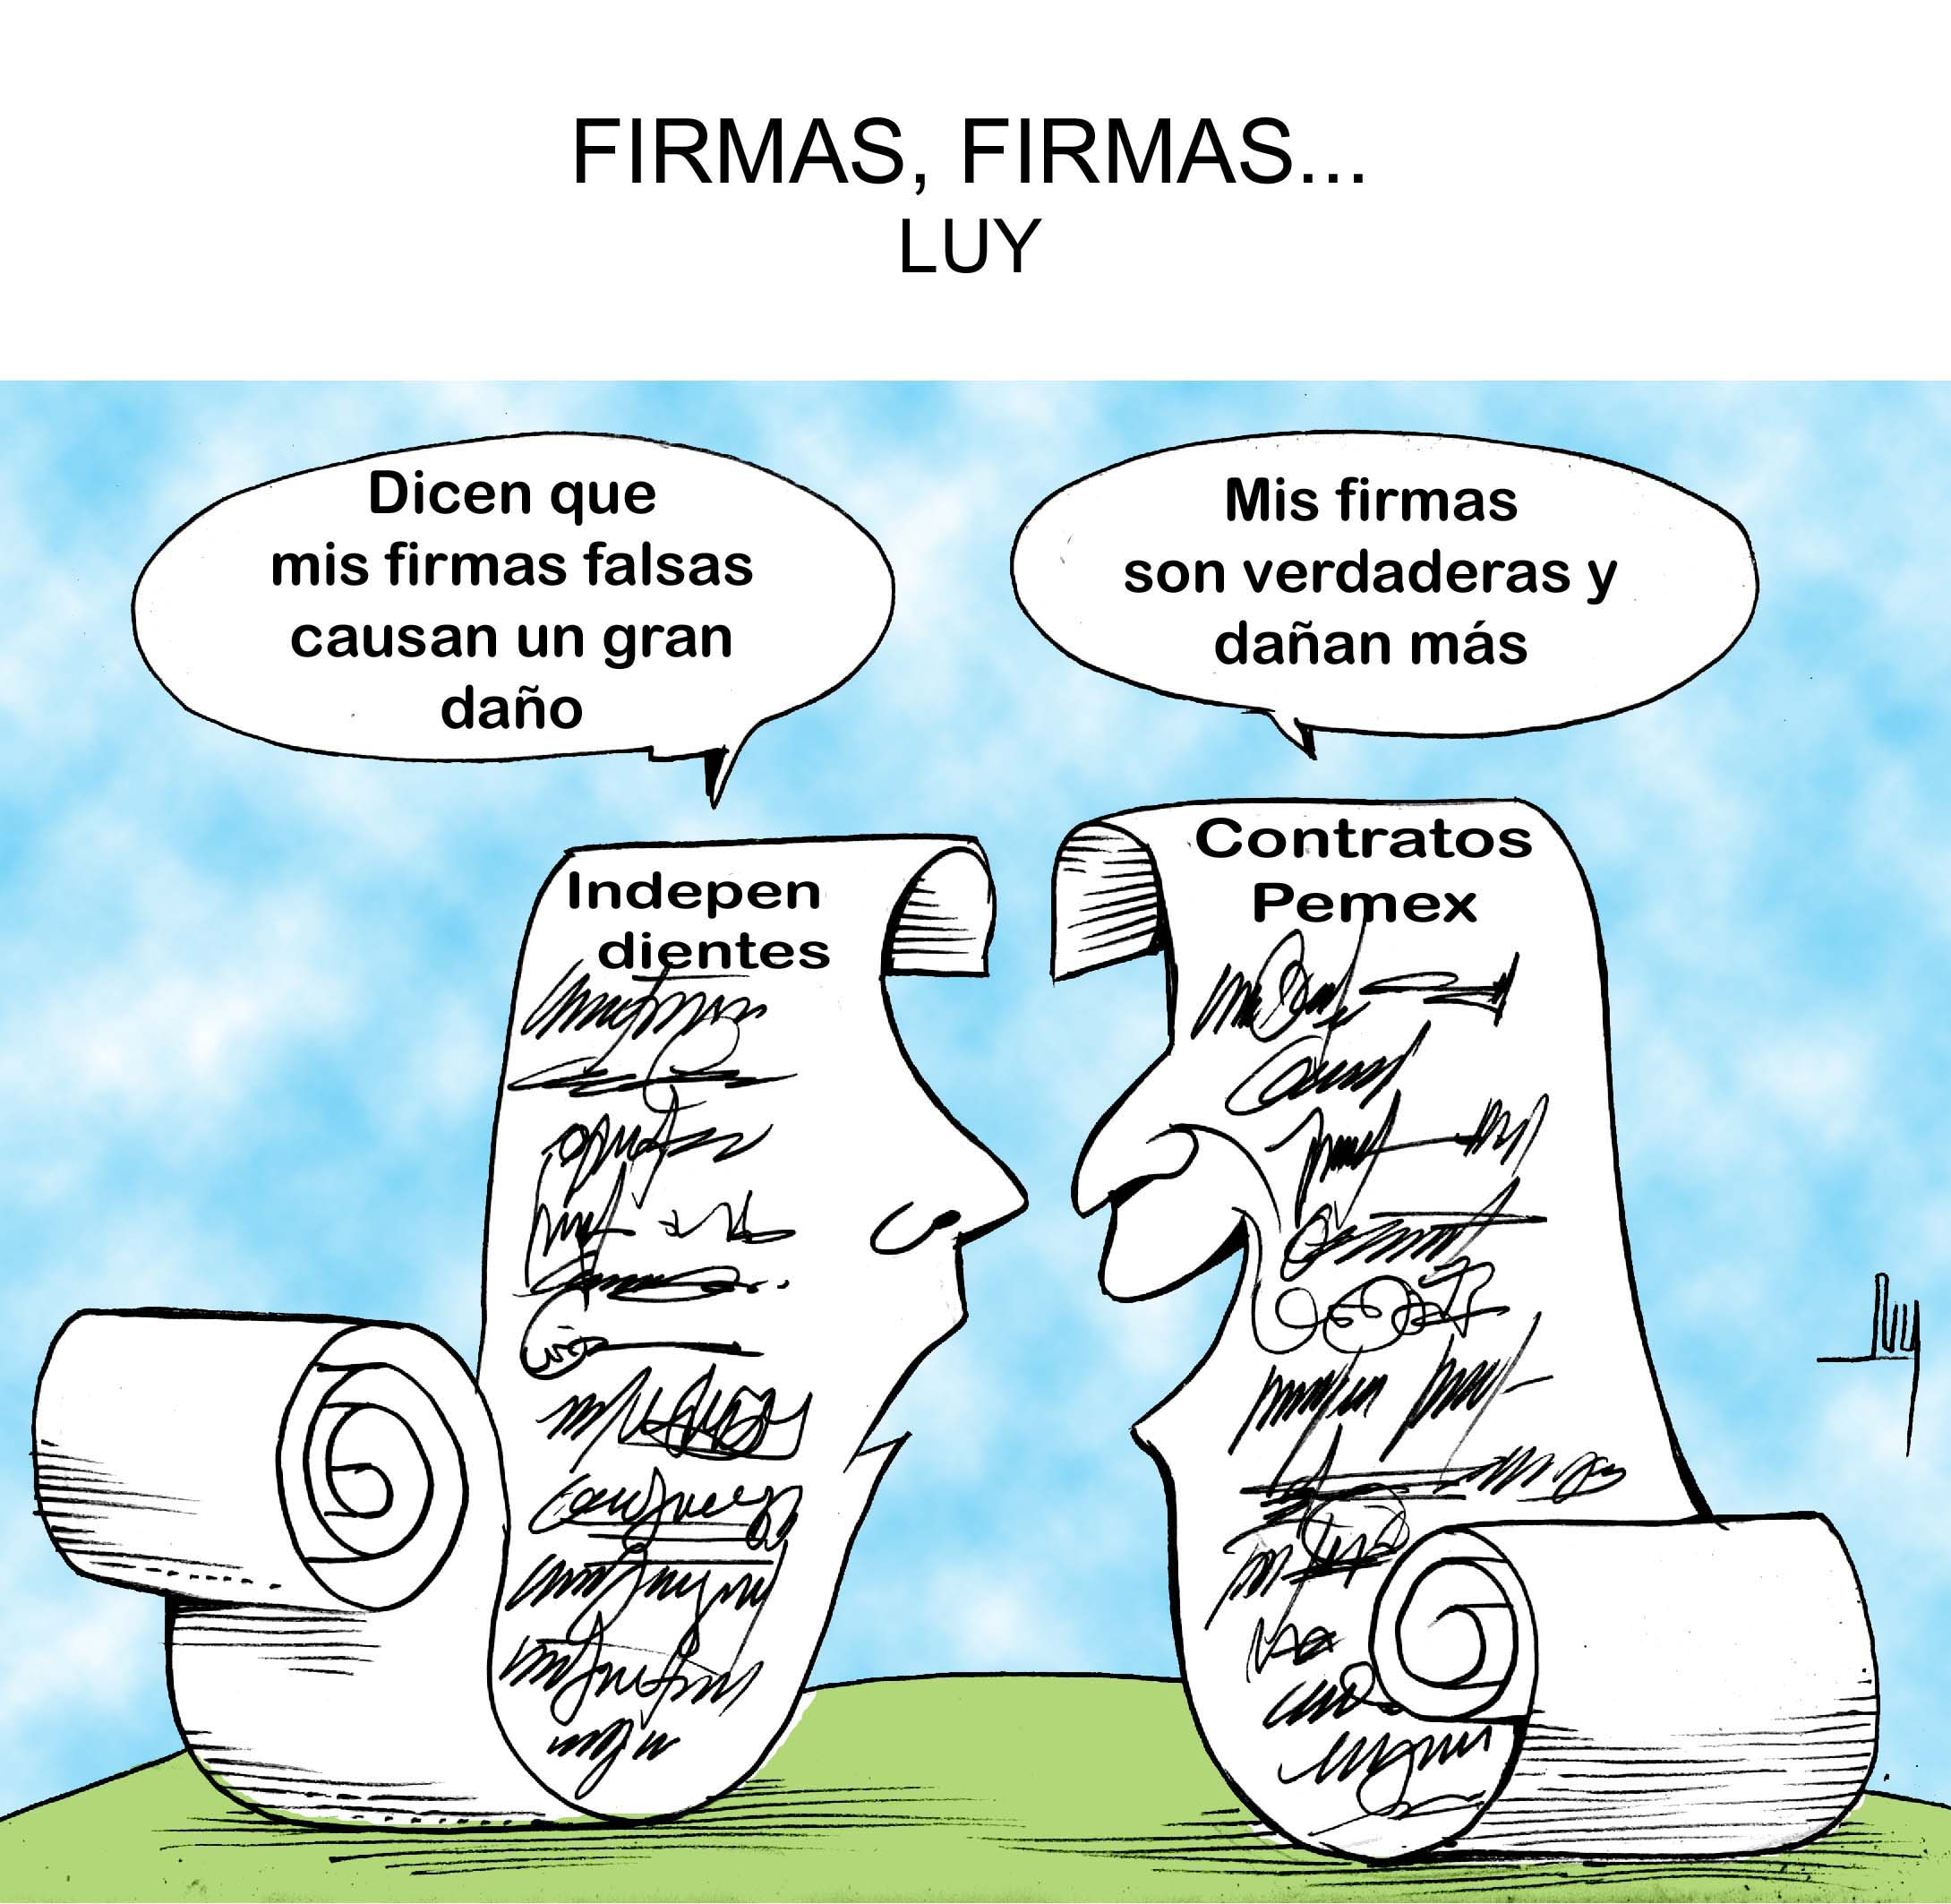 firmas-firmas